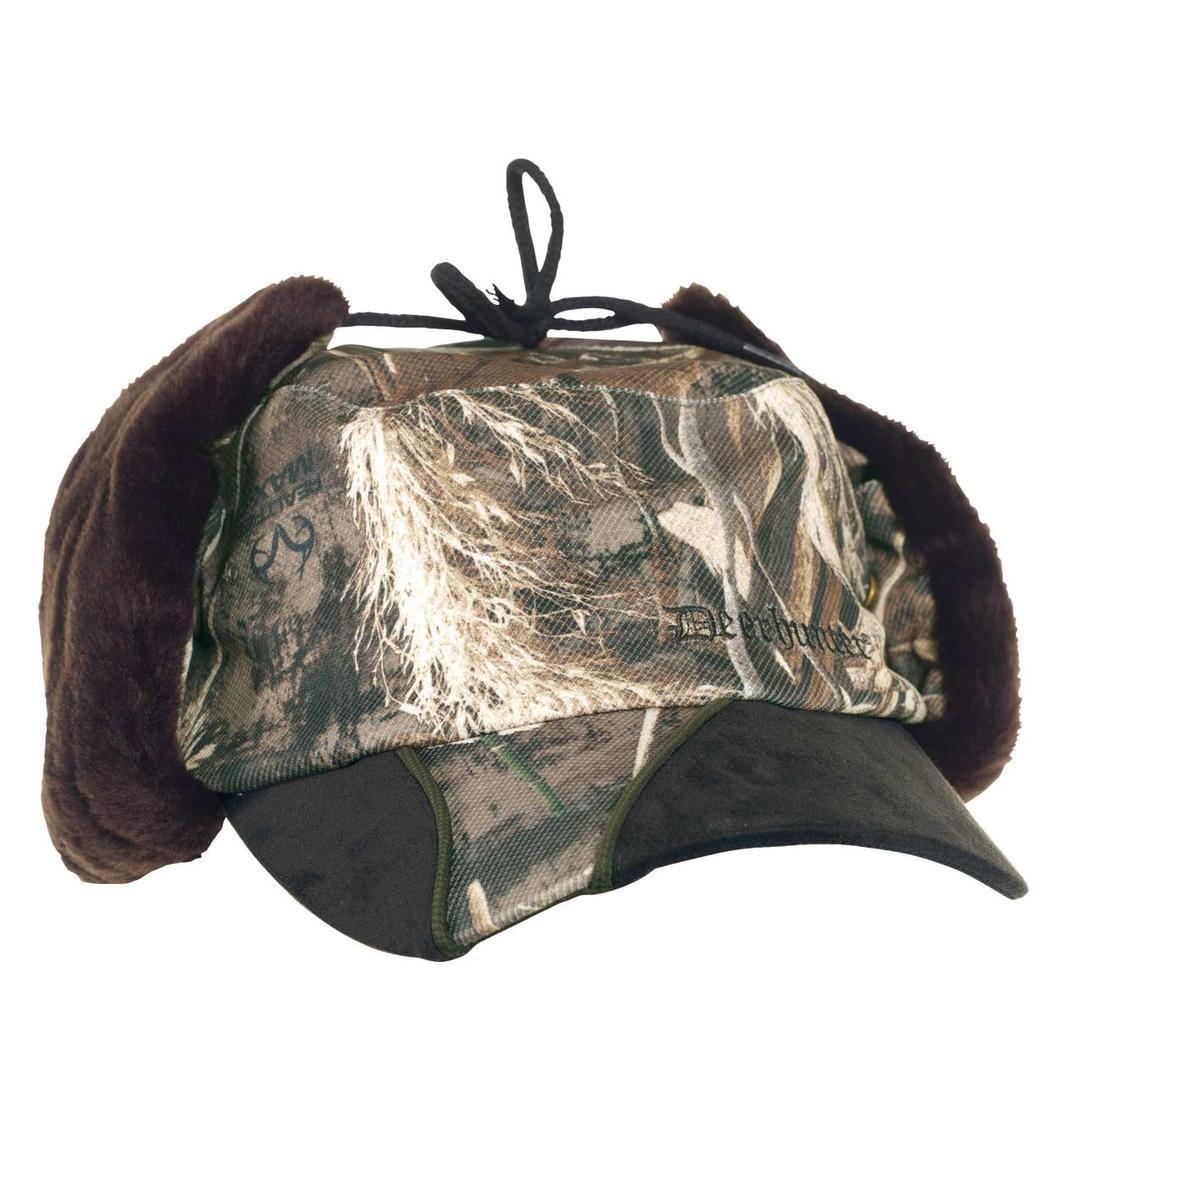 Deerhunter Muflon Winter Hat Max-5